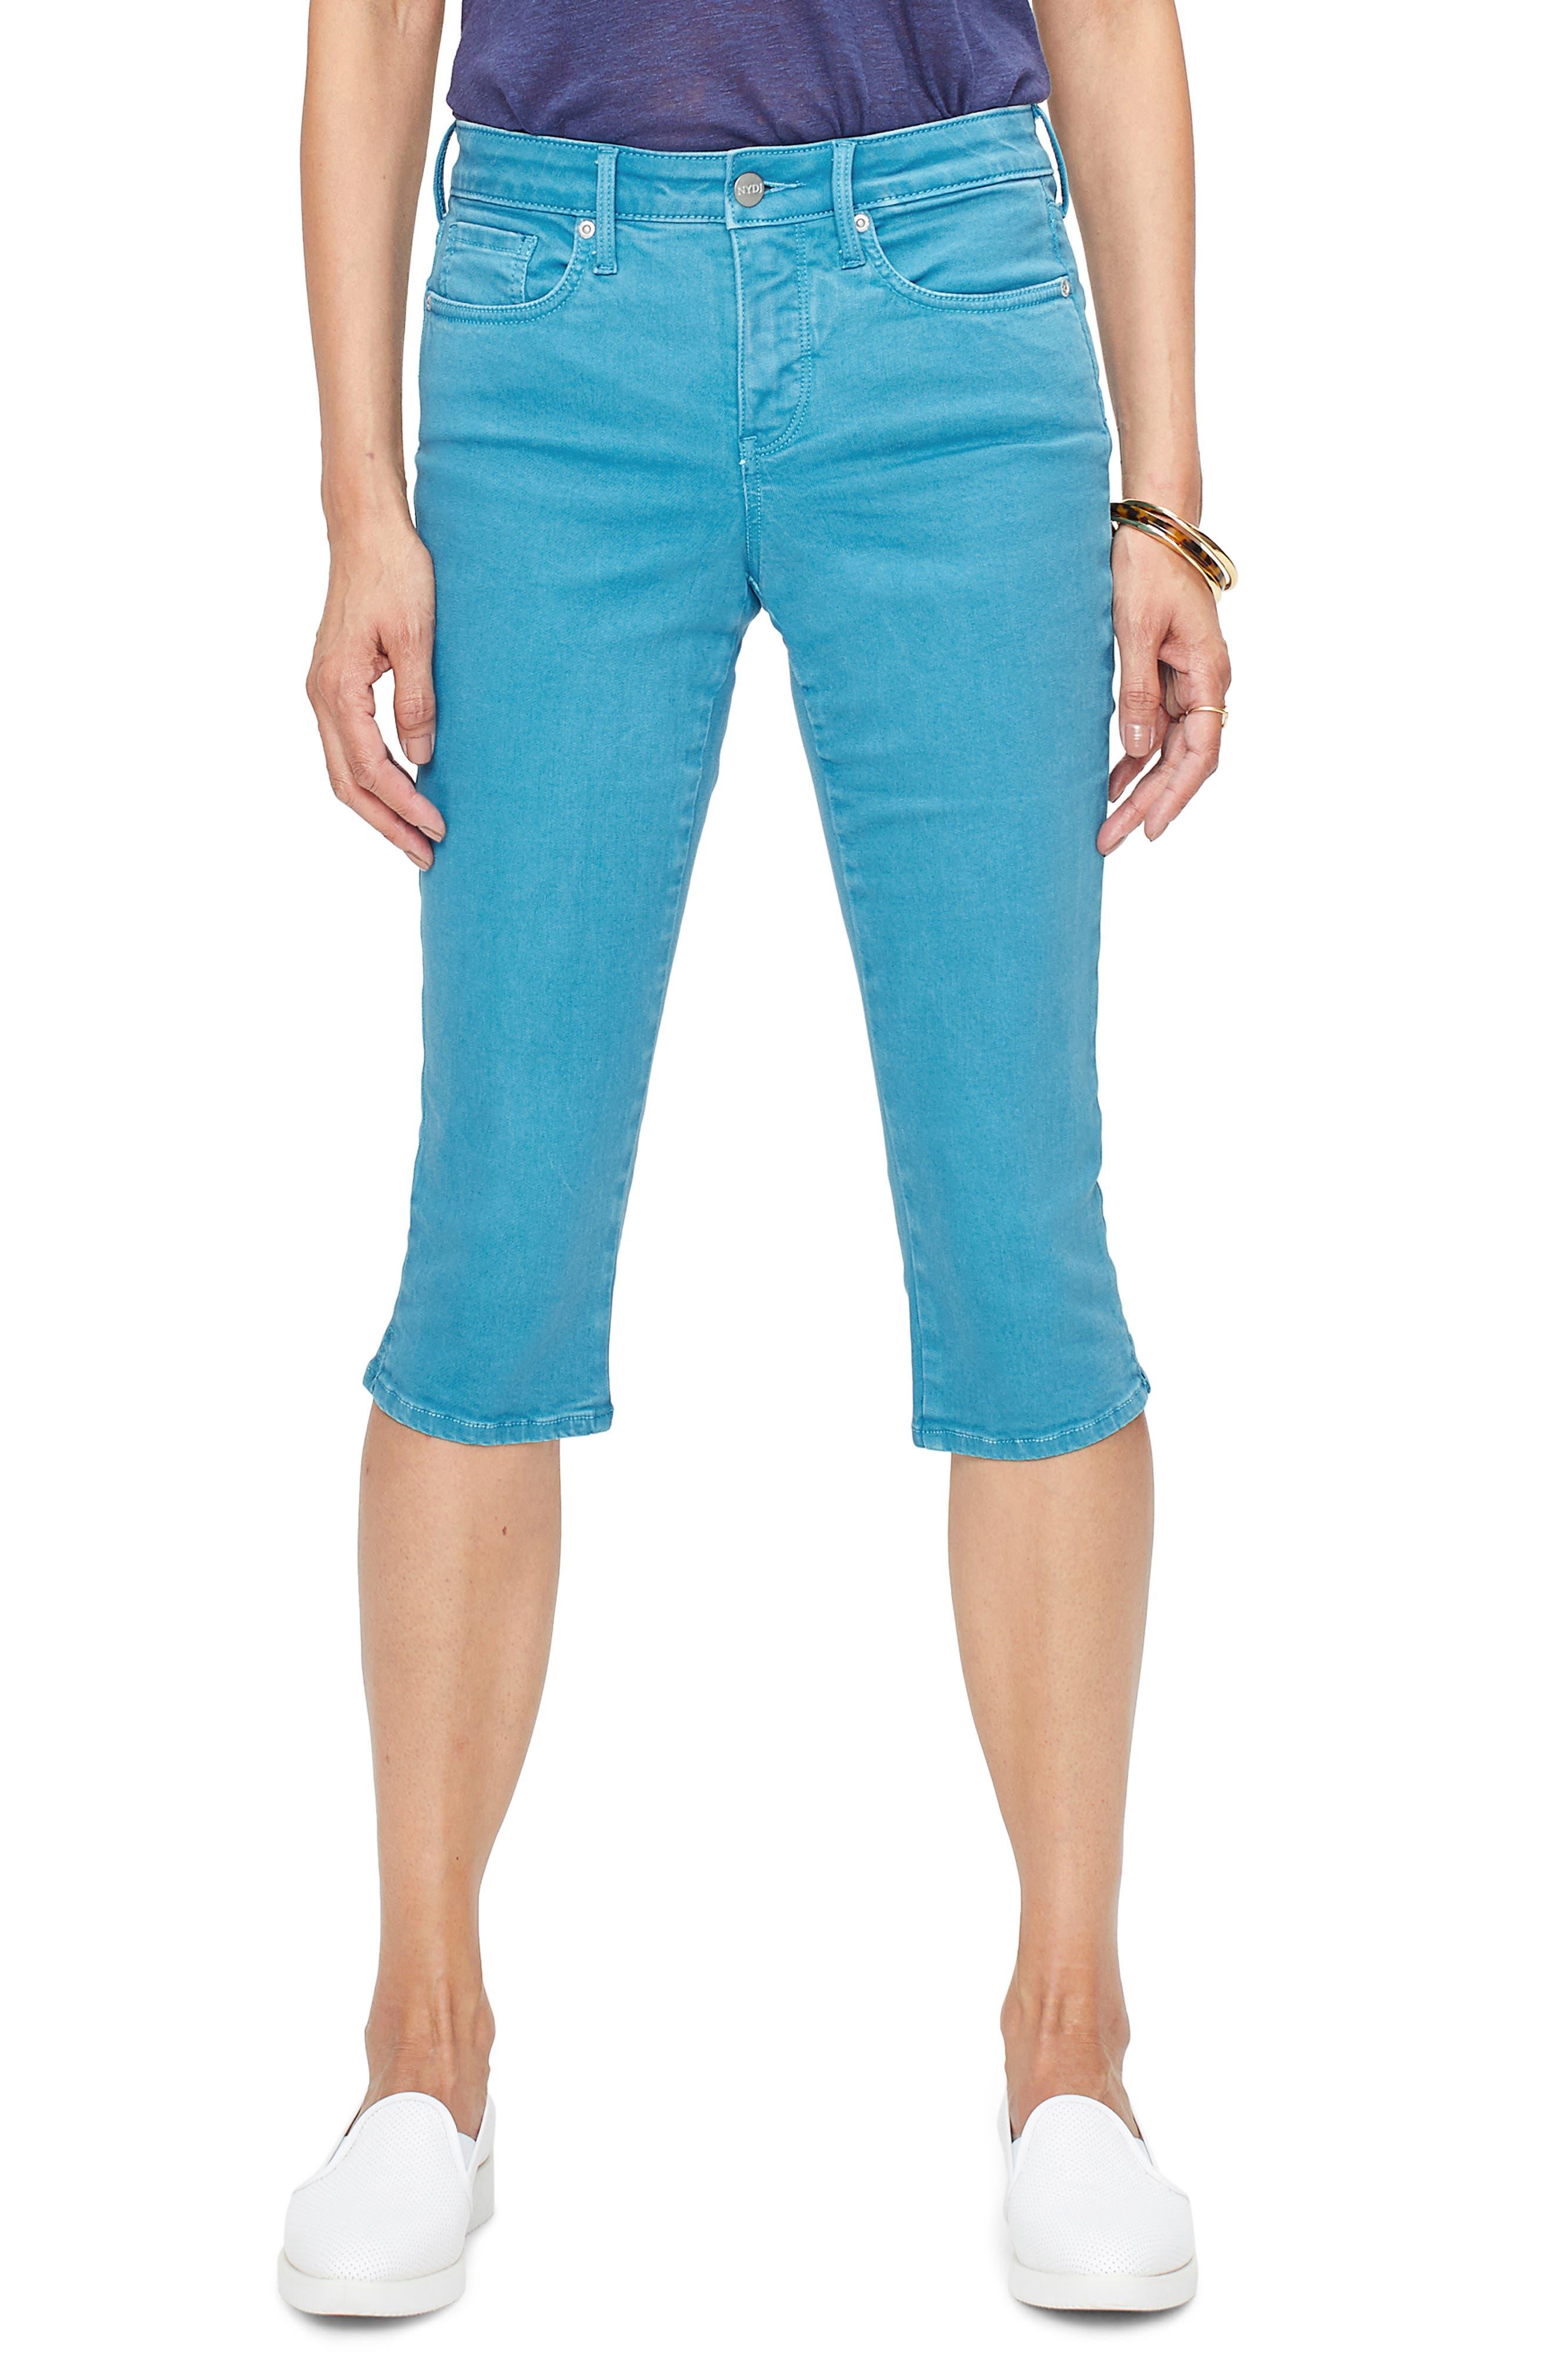 Nydj Capri Skinny Jeans, Blue